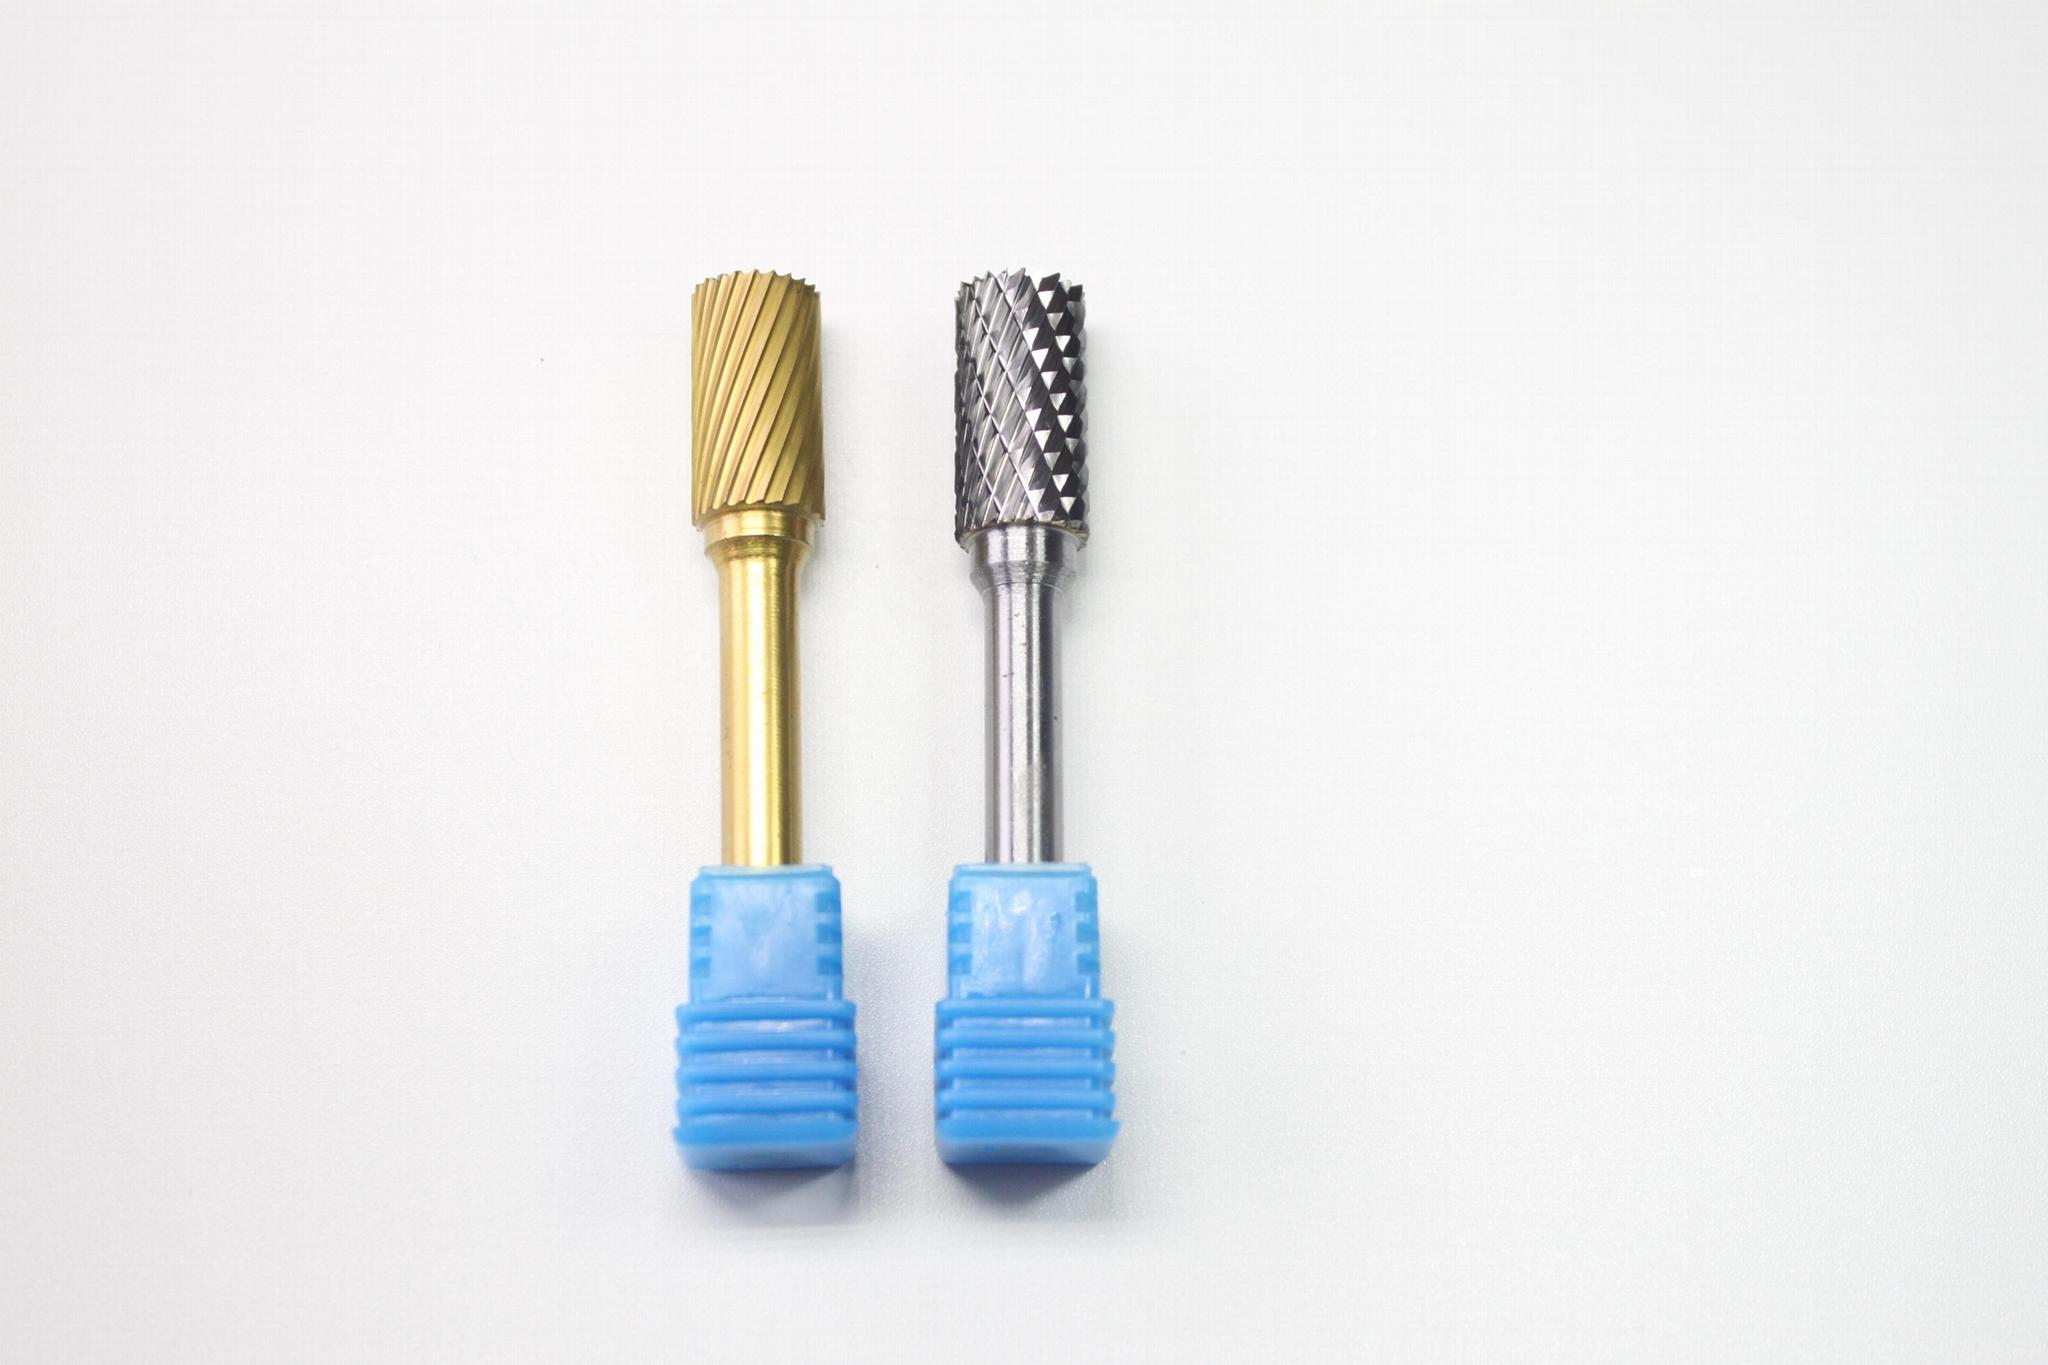 Cutoutil A0616M06 carbide Rotary burrs for cnc machine part